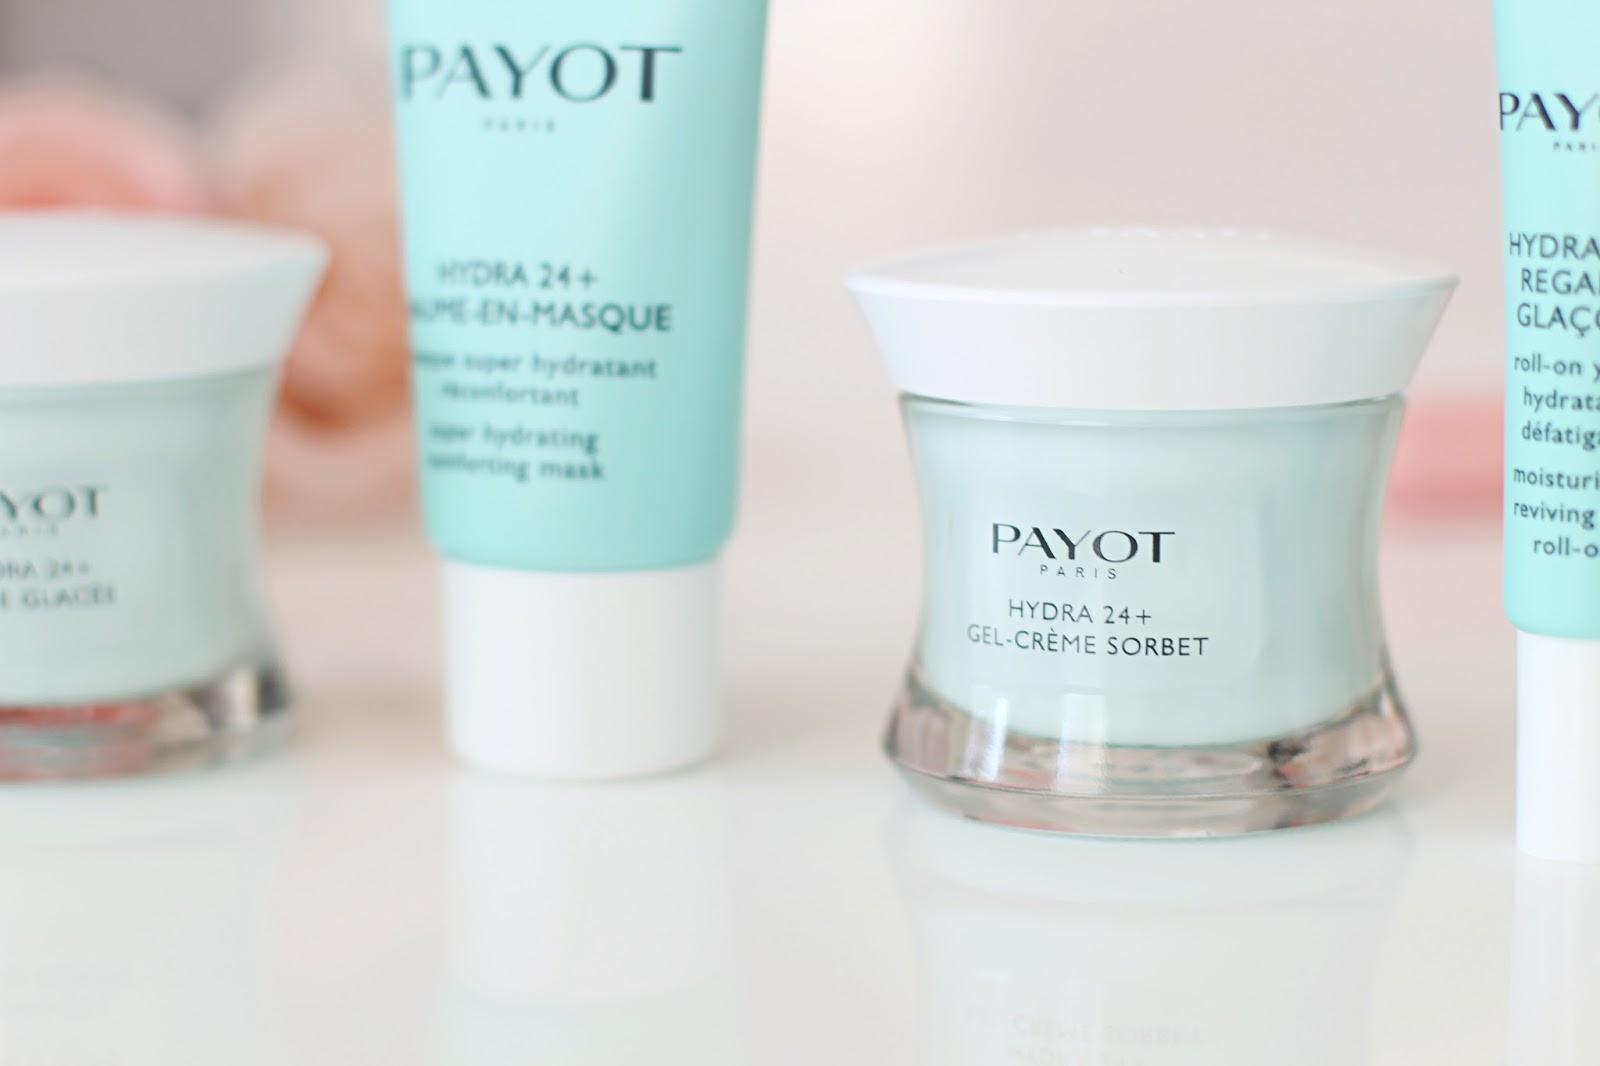 HYDRA 24 + Payot GEL-CRÈME SORBET